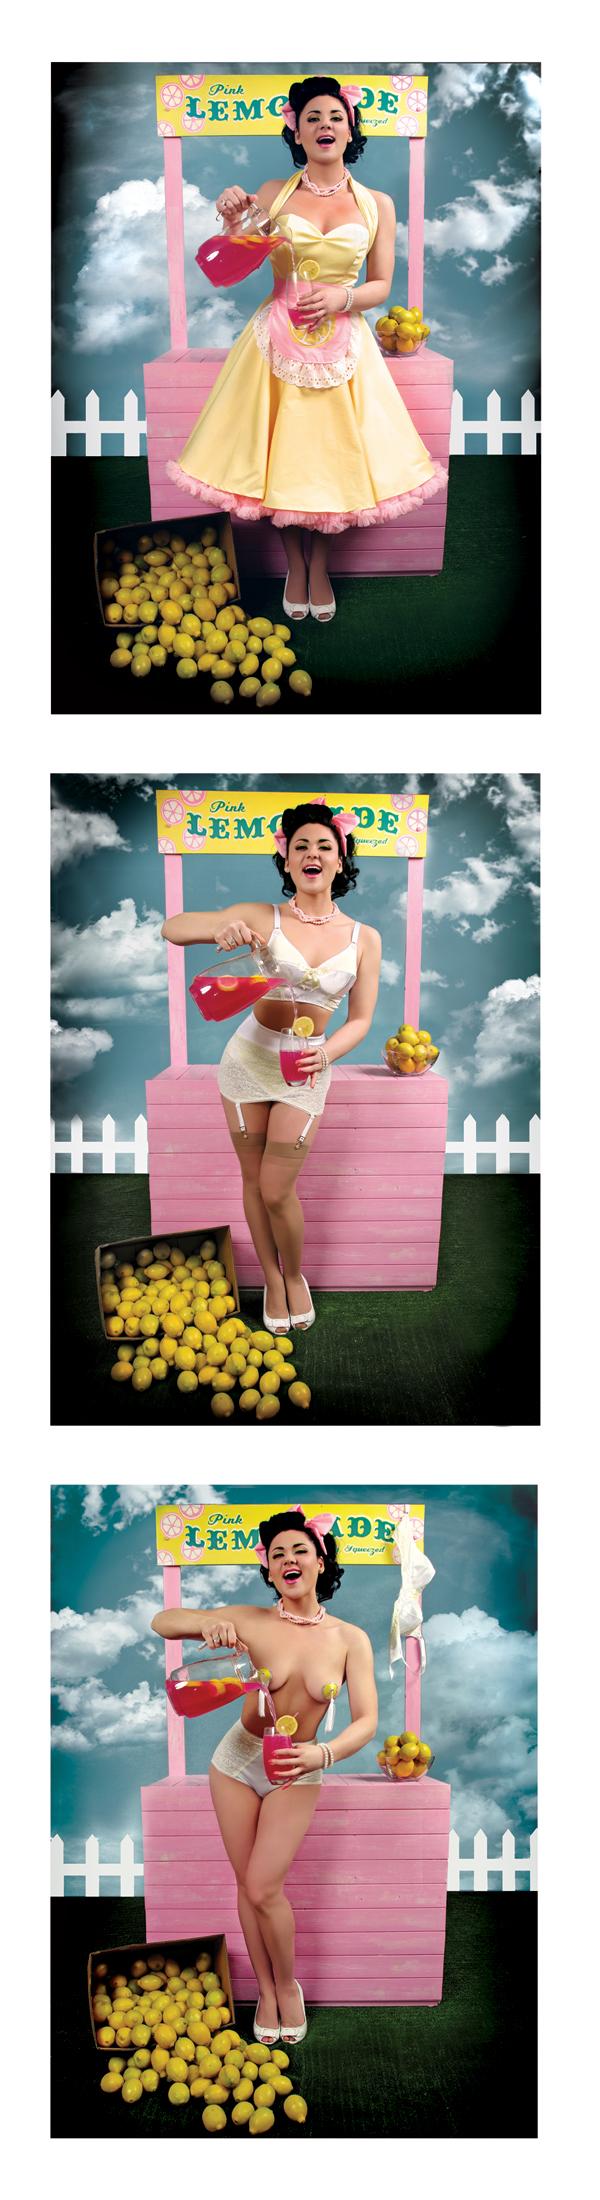 Mar 06, 2009 Self Portrait ~ Roxi Dlite Photography  When Life Gives You Lemons